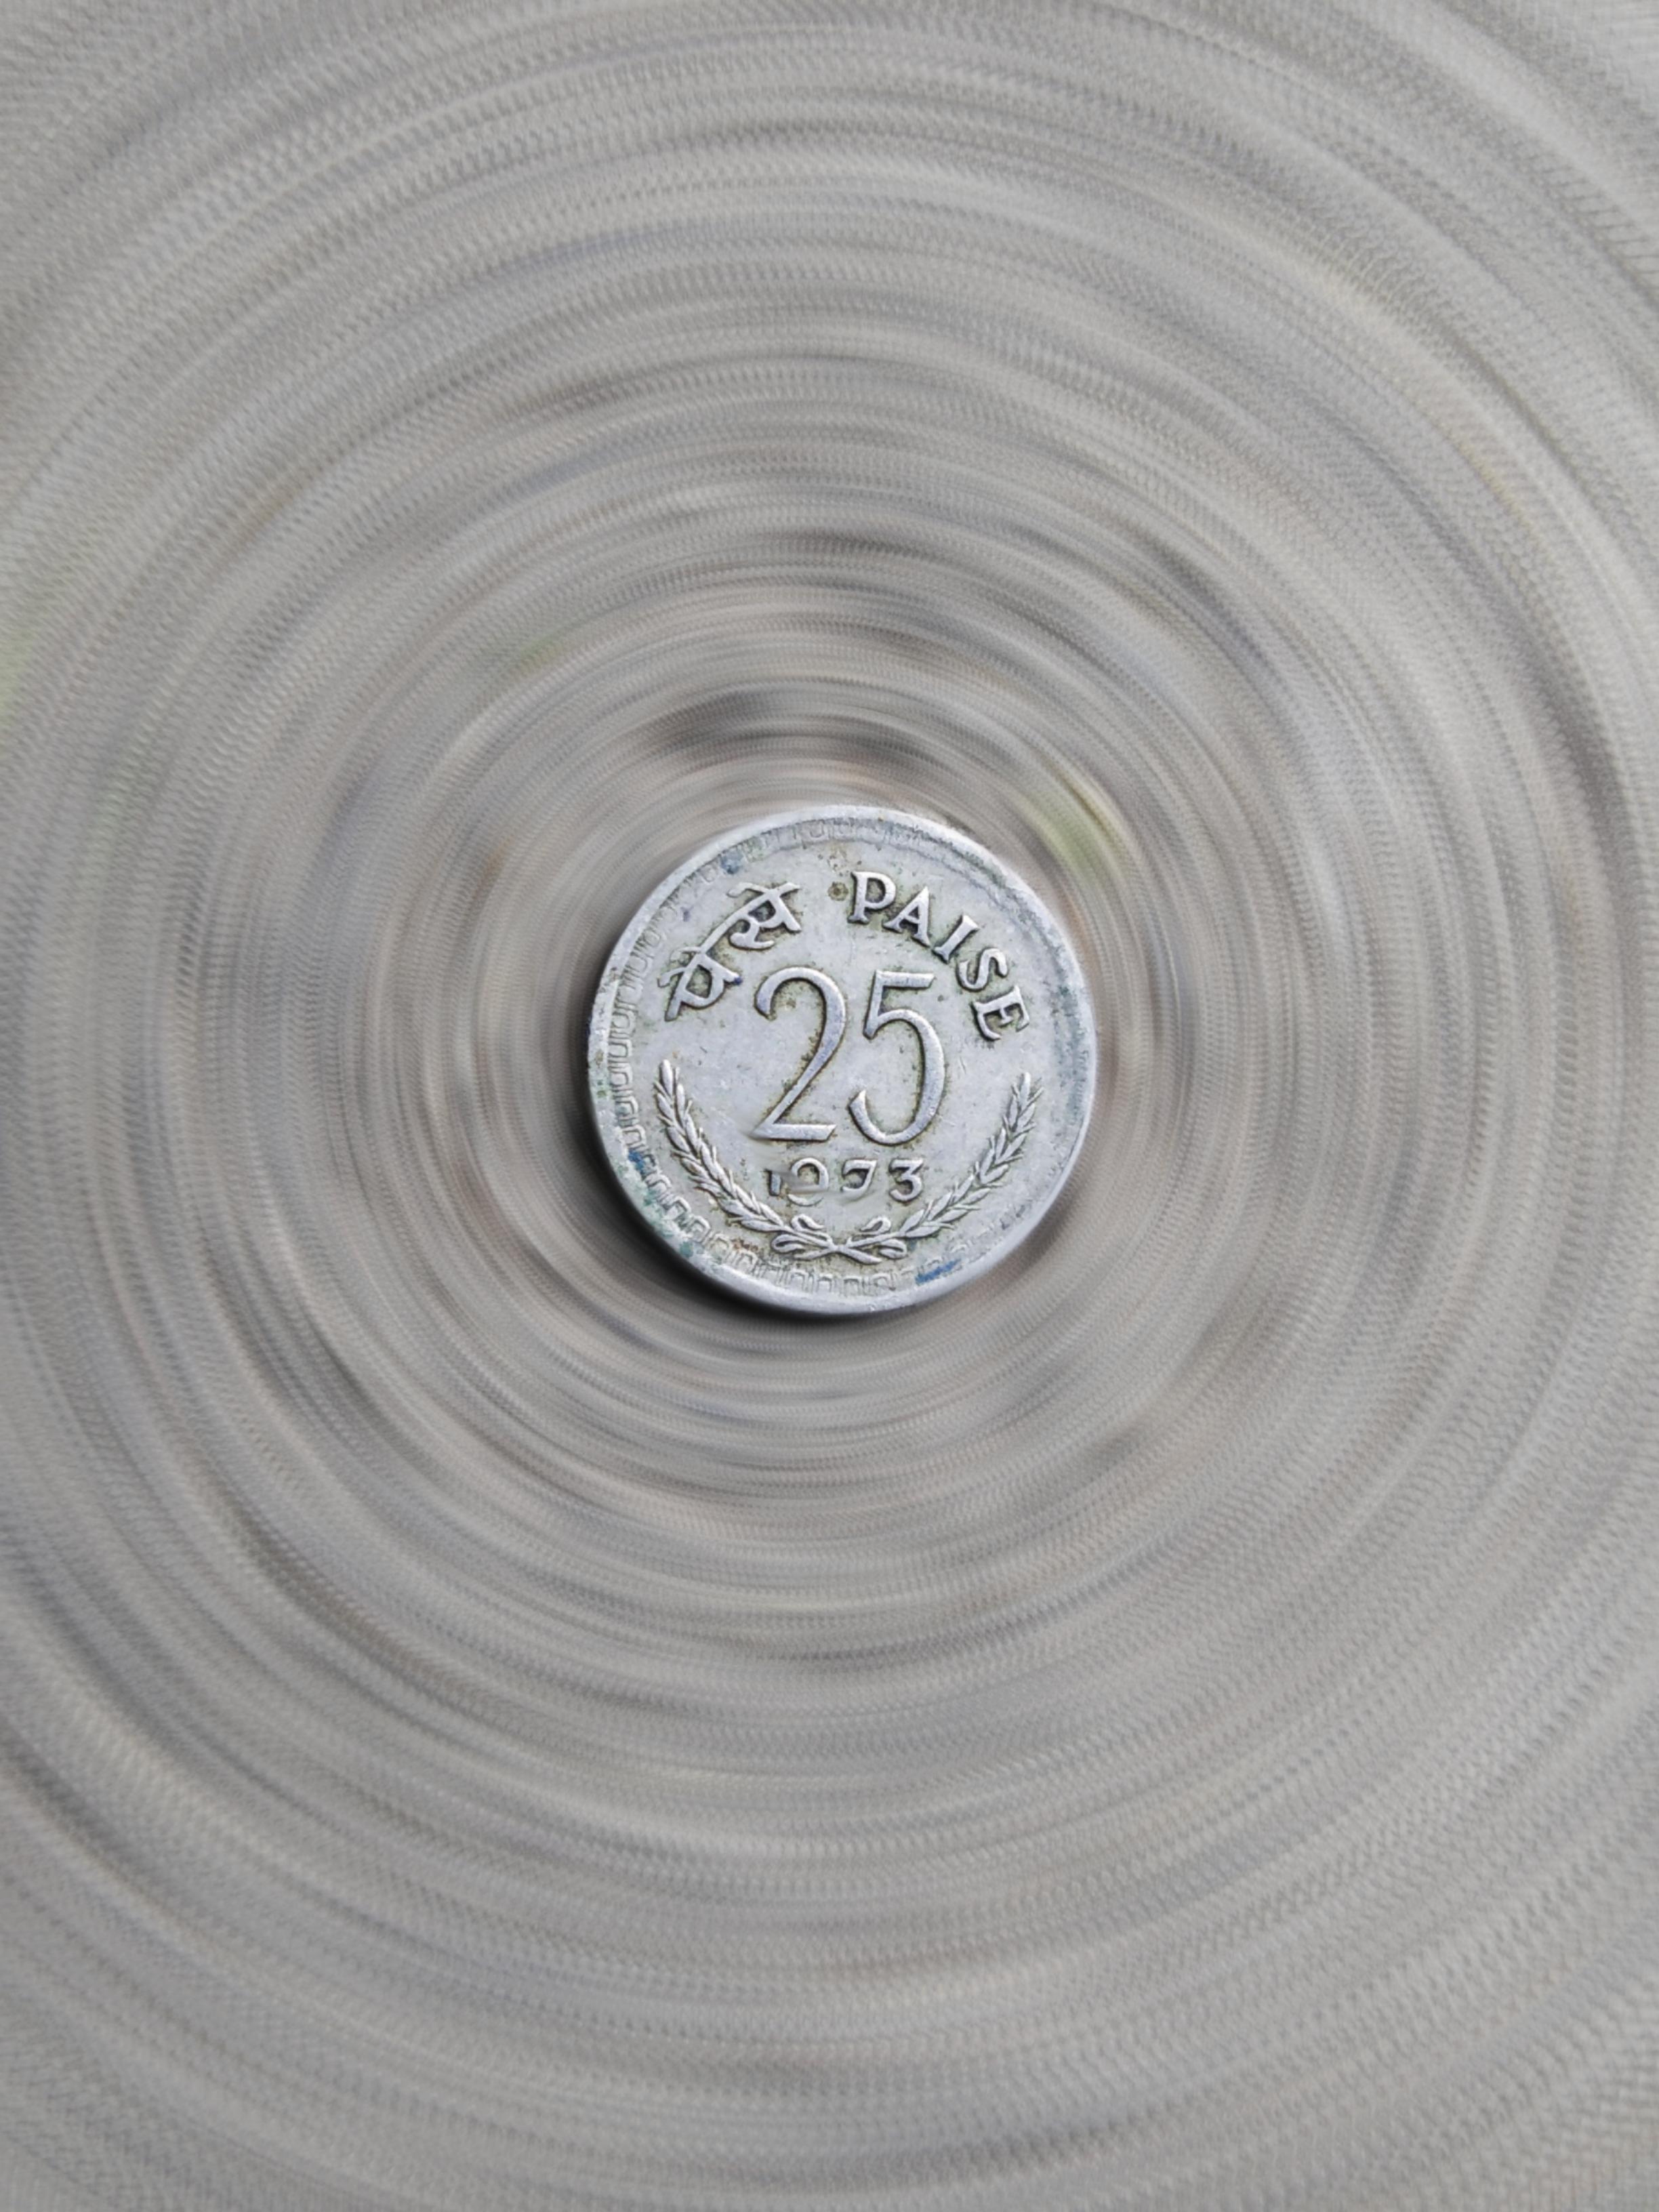 25 paisa coin